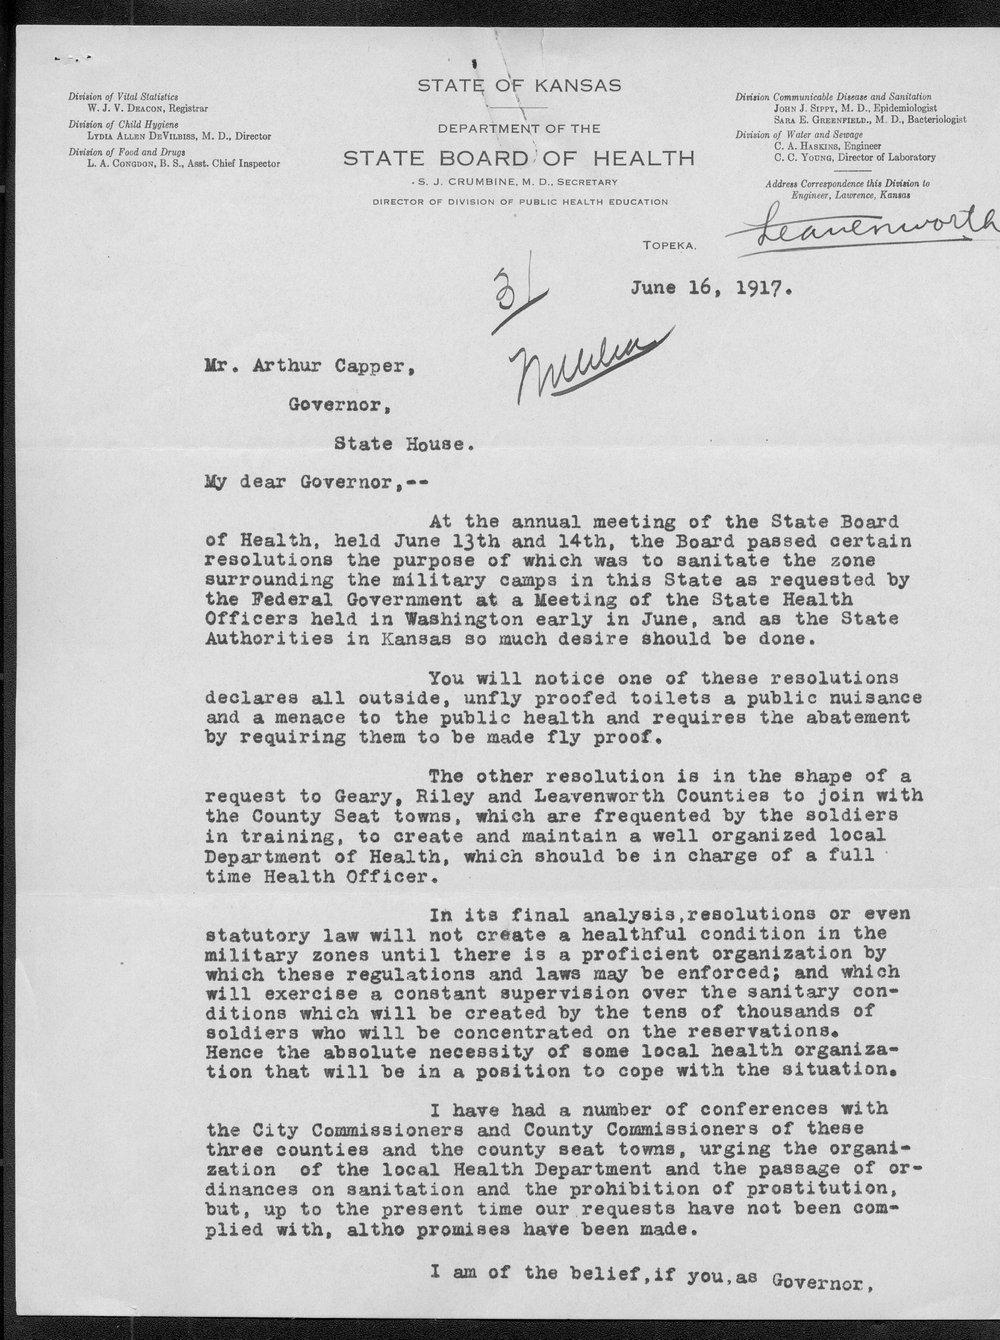 Samuel Crumbine to Governor Arthur Capper - 1